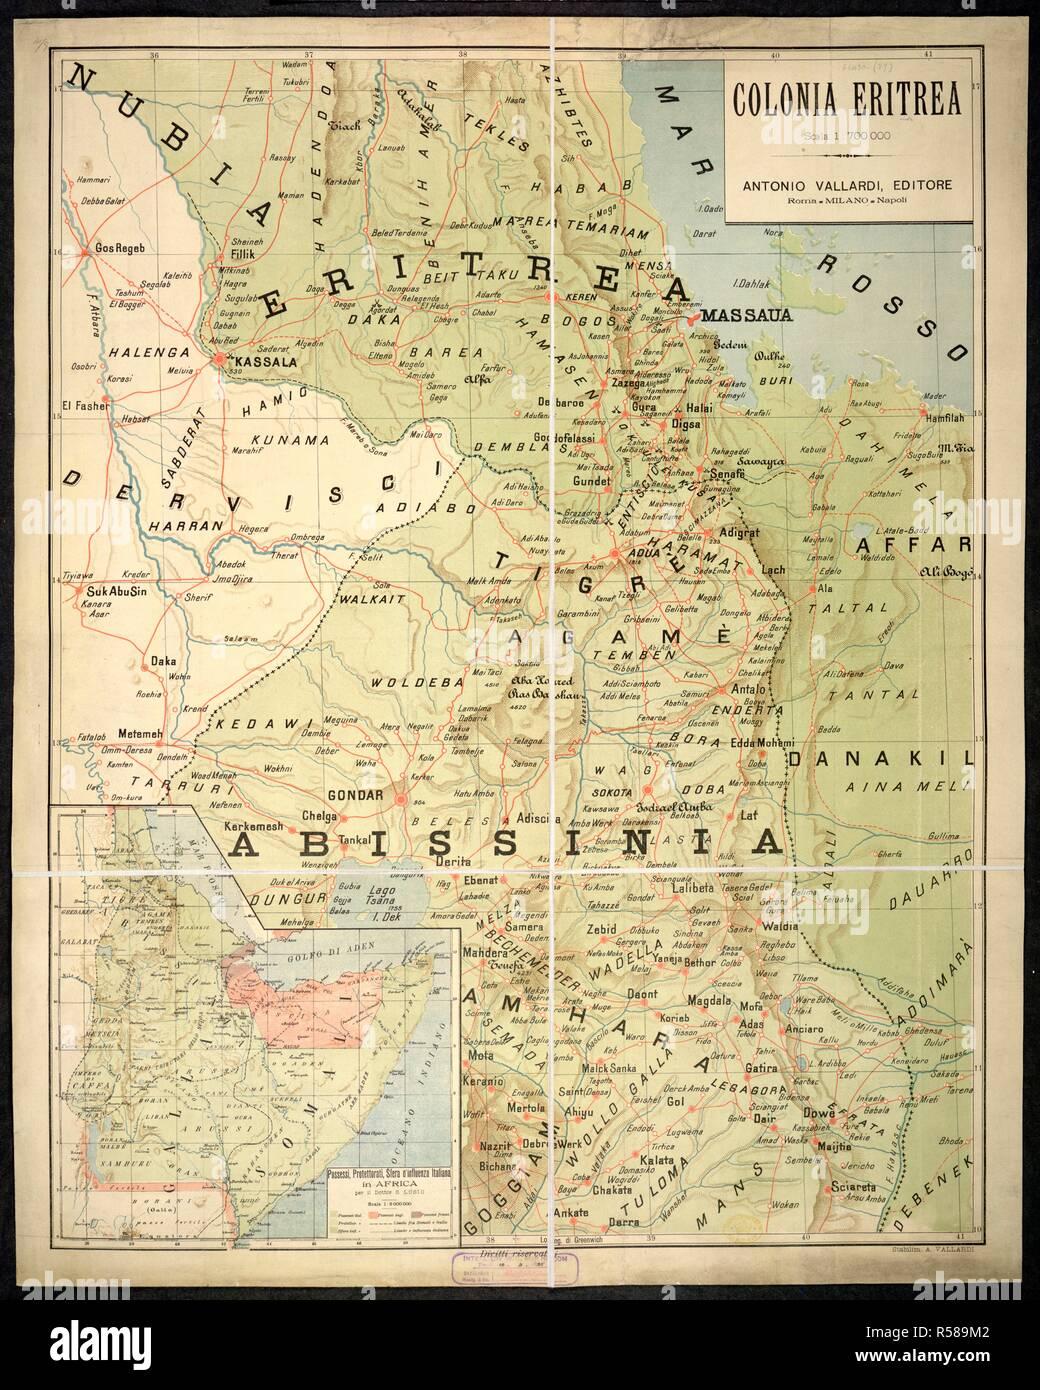 A map of Eritrea. Colonia Eritrea. Scala 1 : 700,000. Milano ... Scala Map on